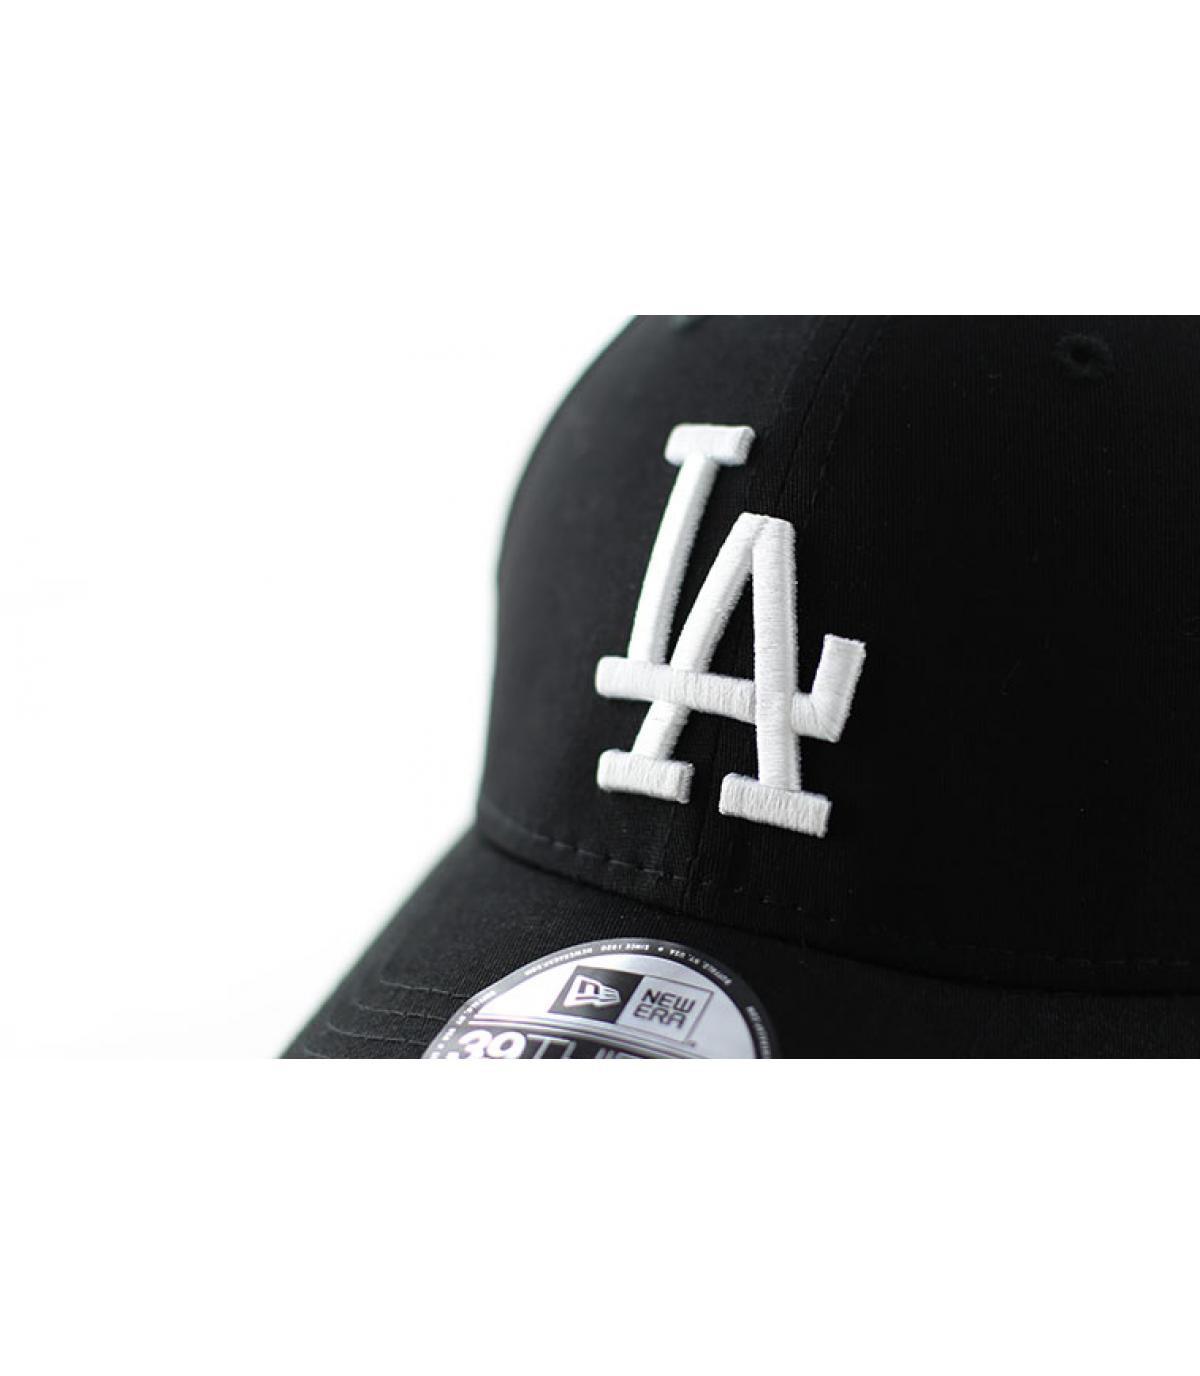 Dettagli League Ess LA 9Forty black white - image 3